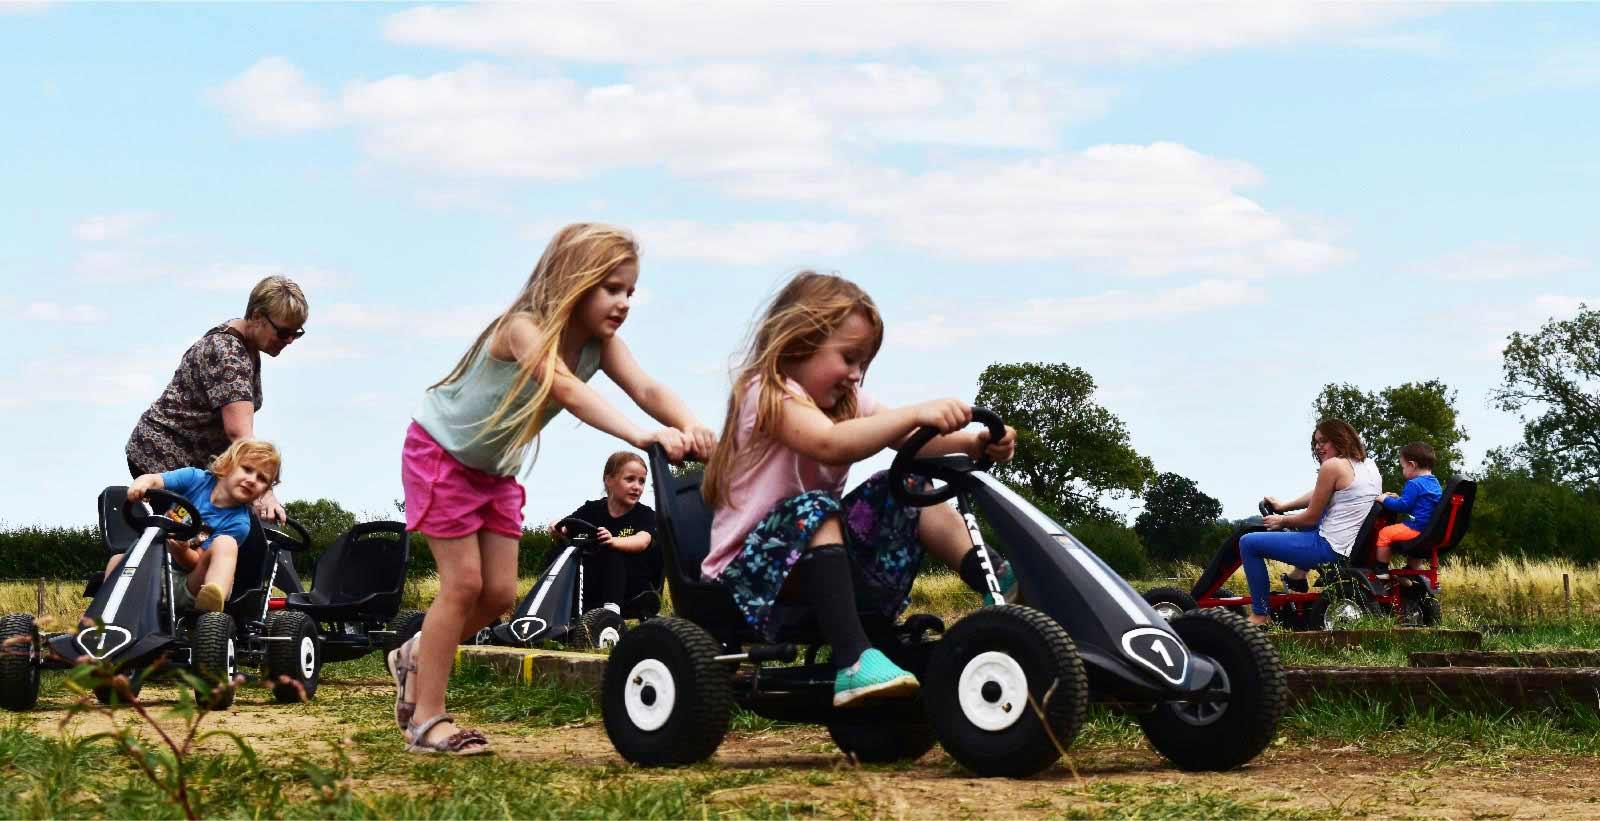 Fosseway Fun Farm